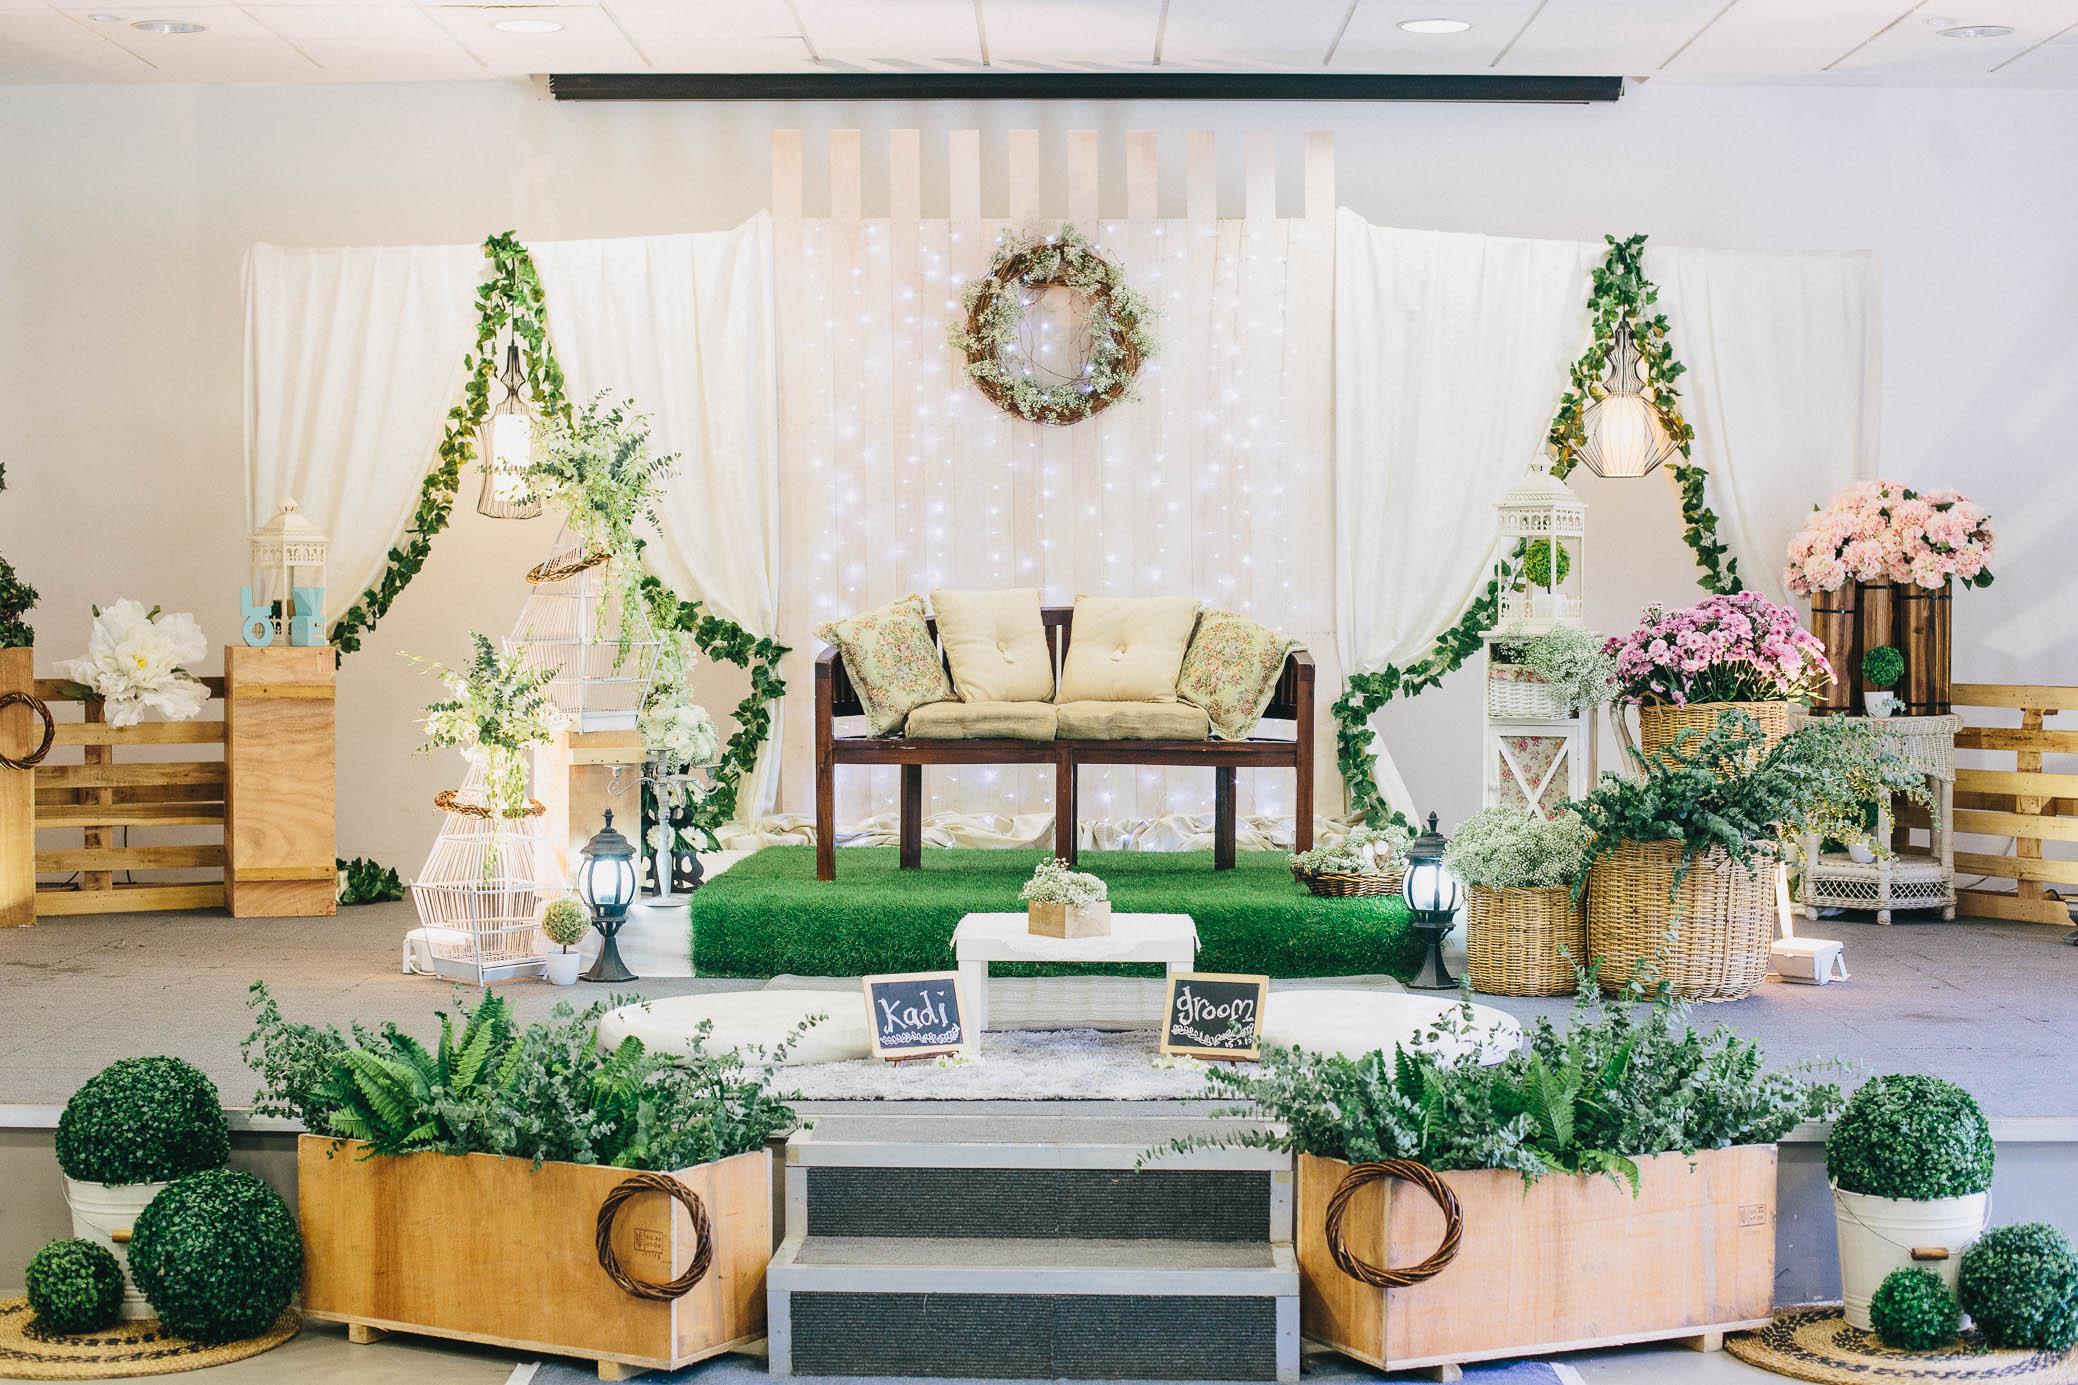 singapore-wedding-photographer-malay-indian-pre-wedding-travel-wmt-2015-79.jpg